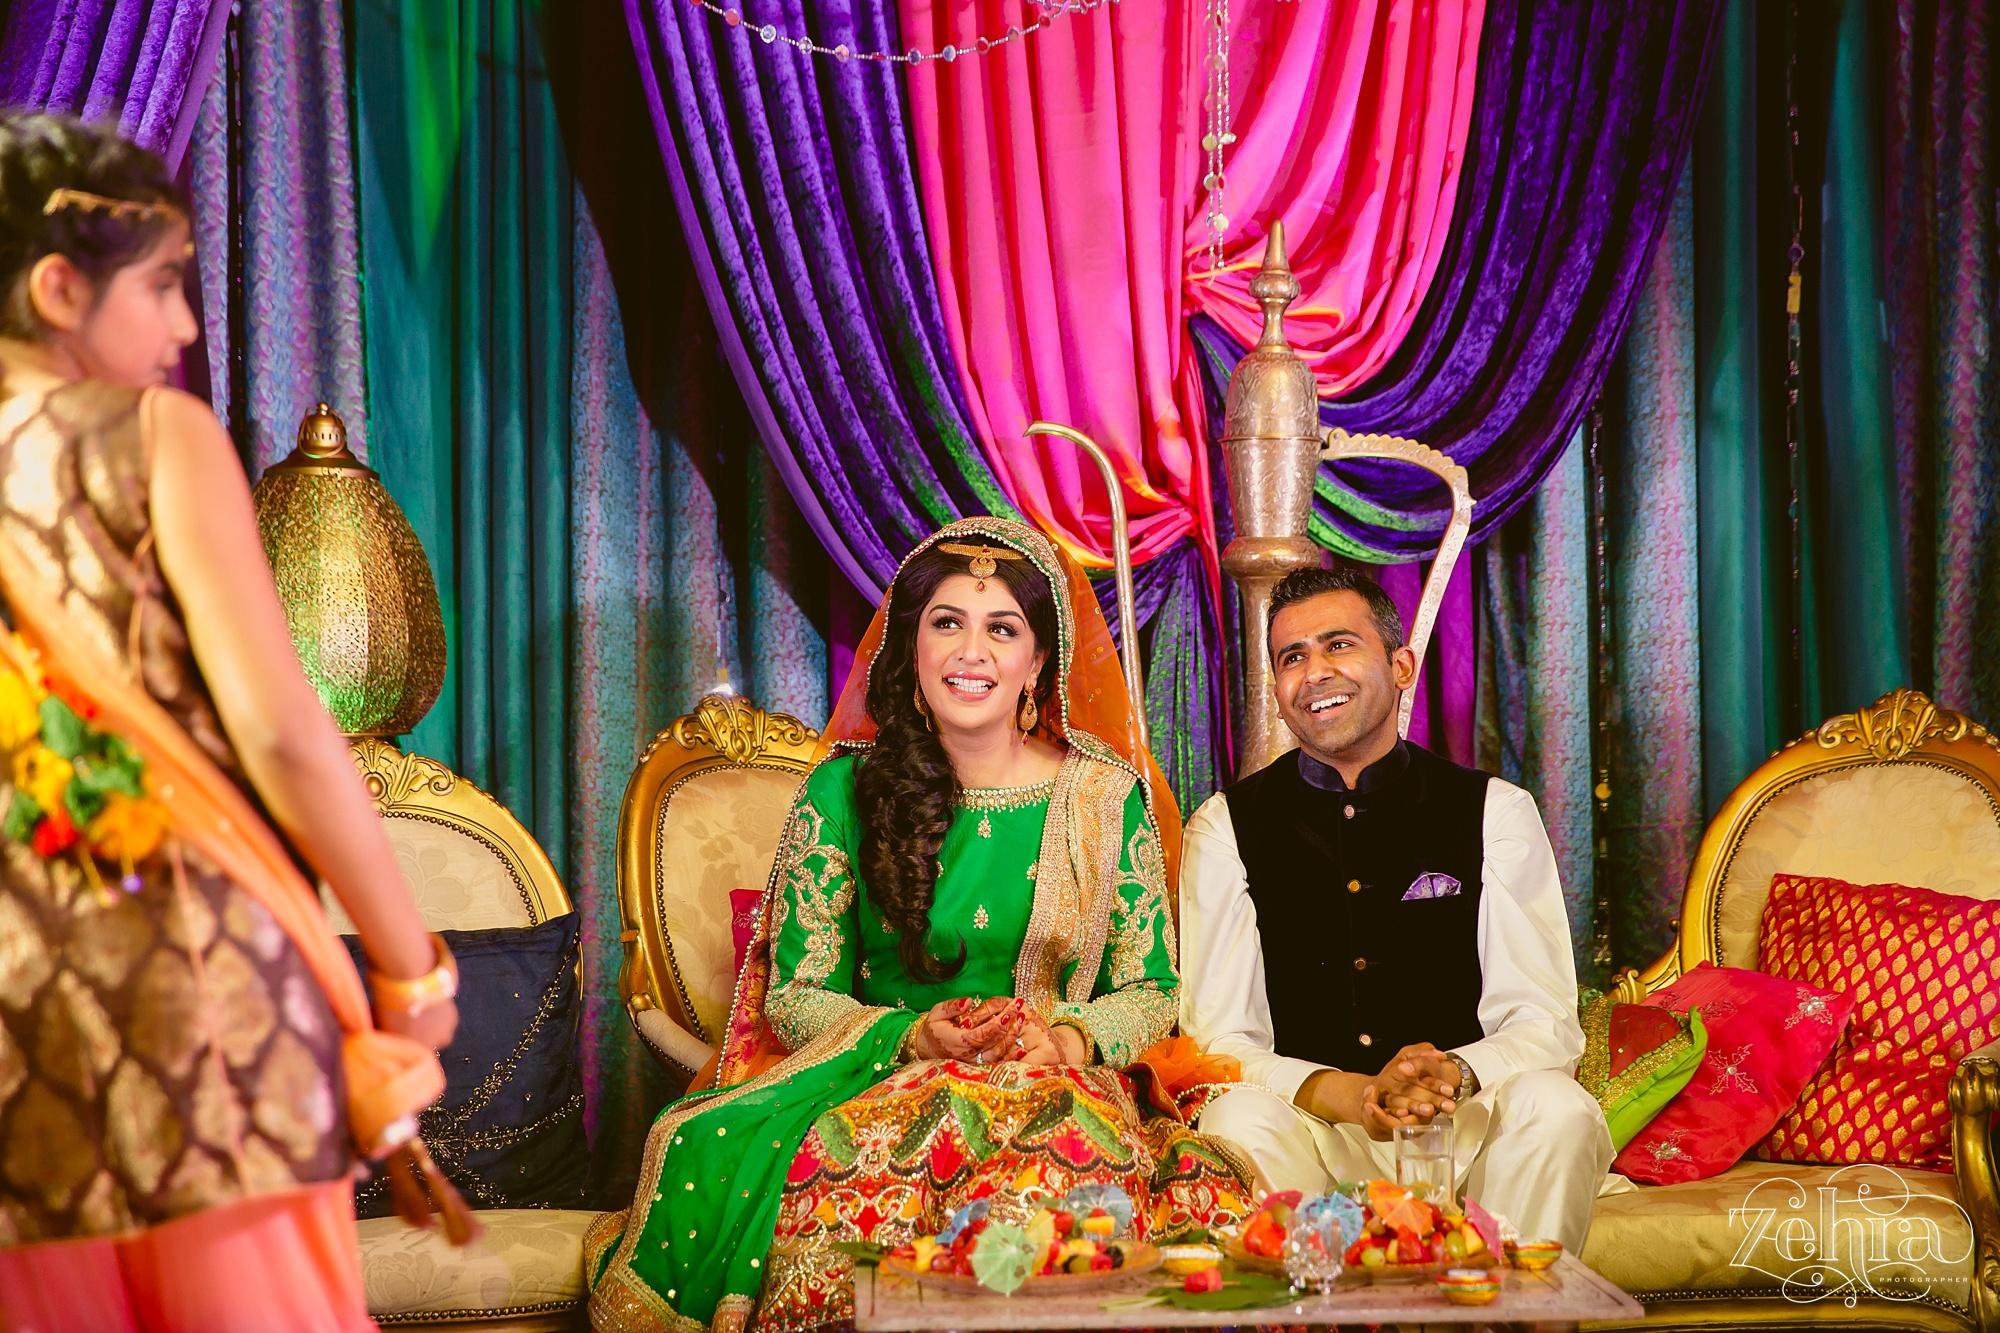 zehra wedding photographer arley hall cheshire048.jpg